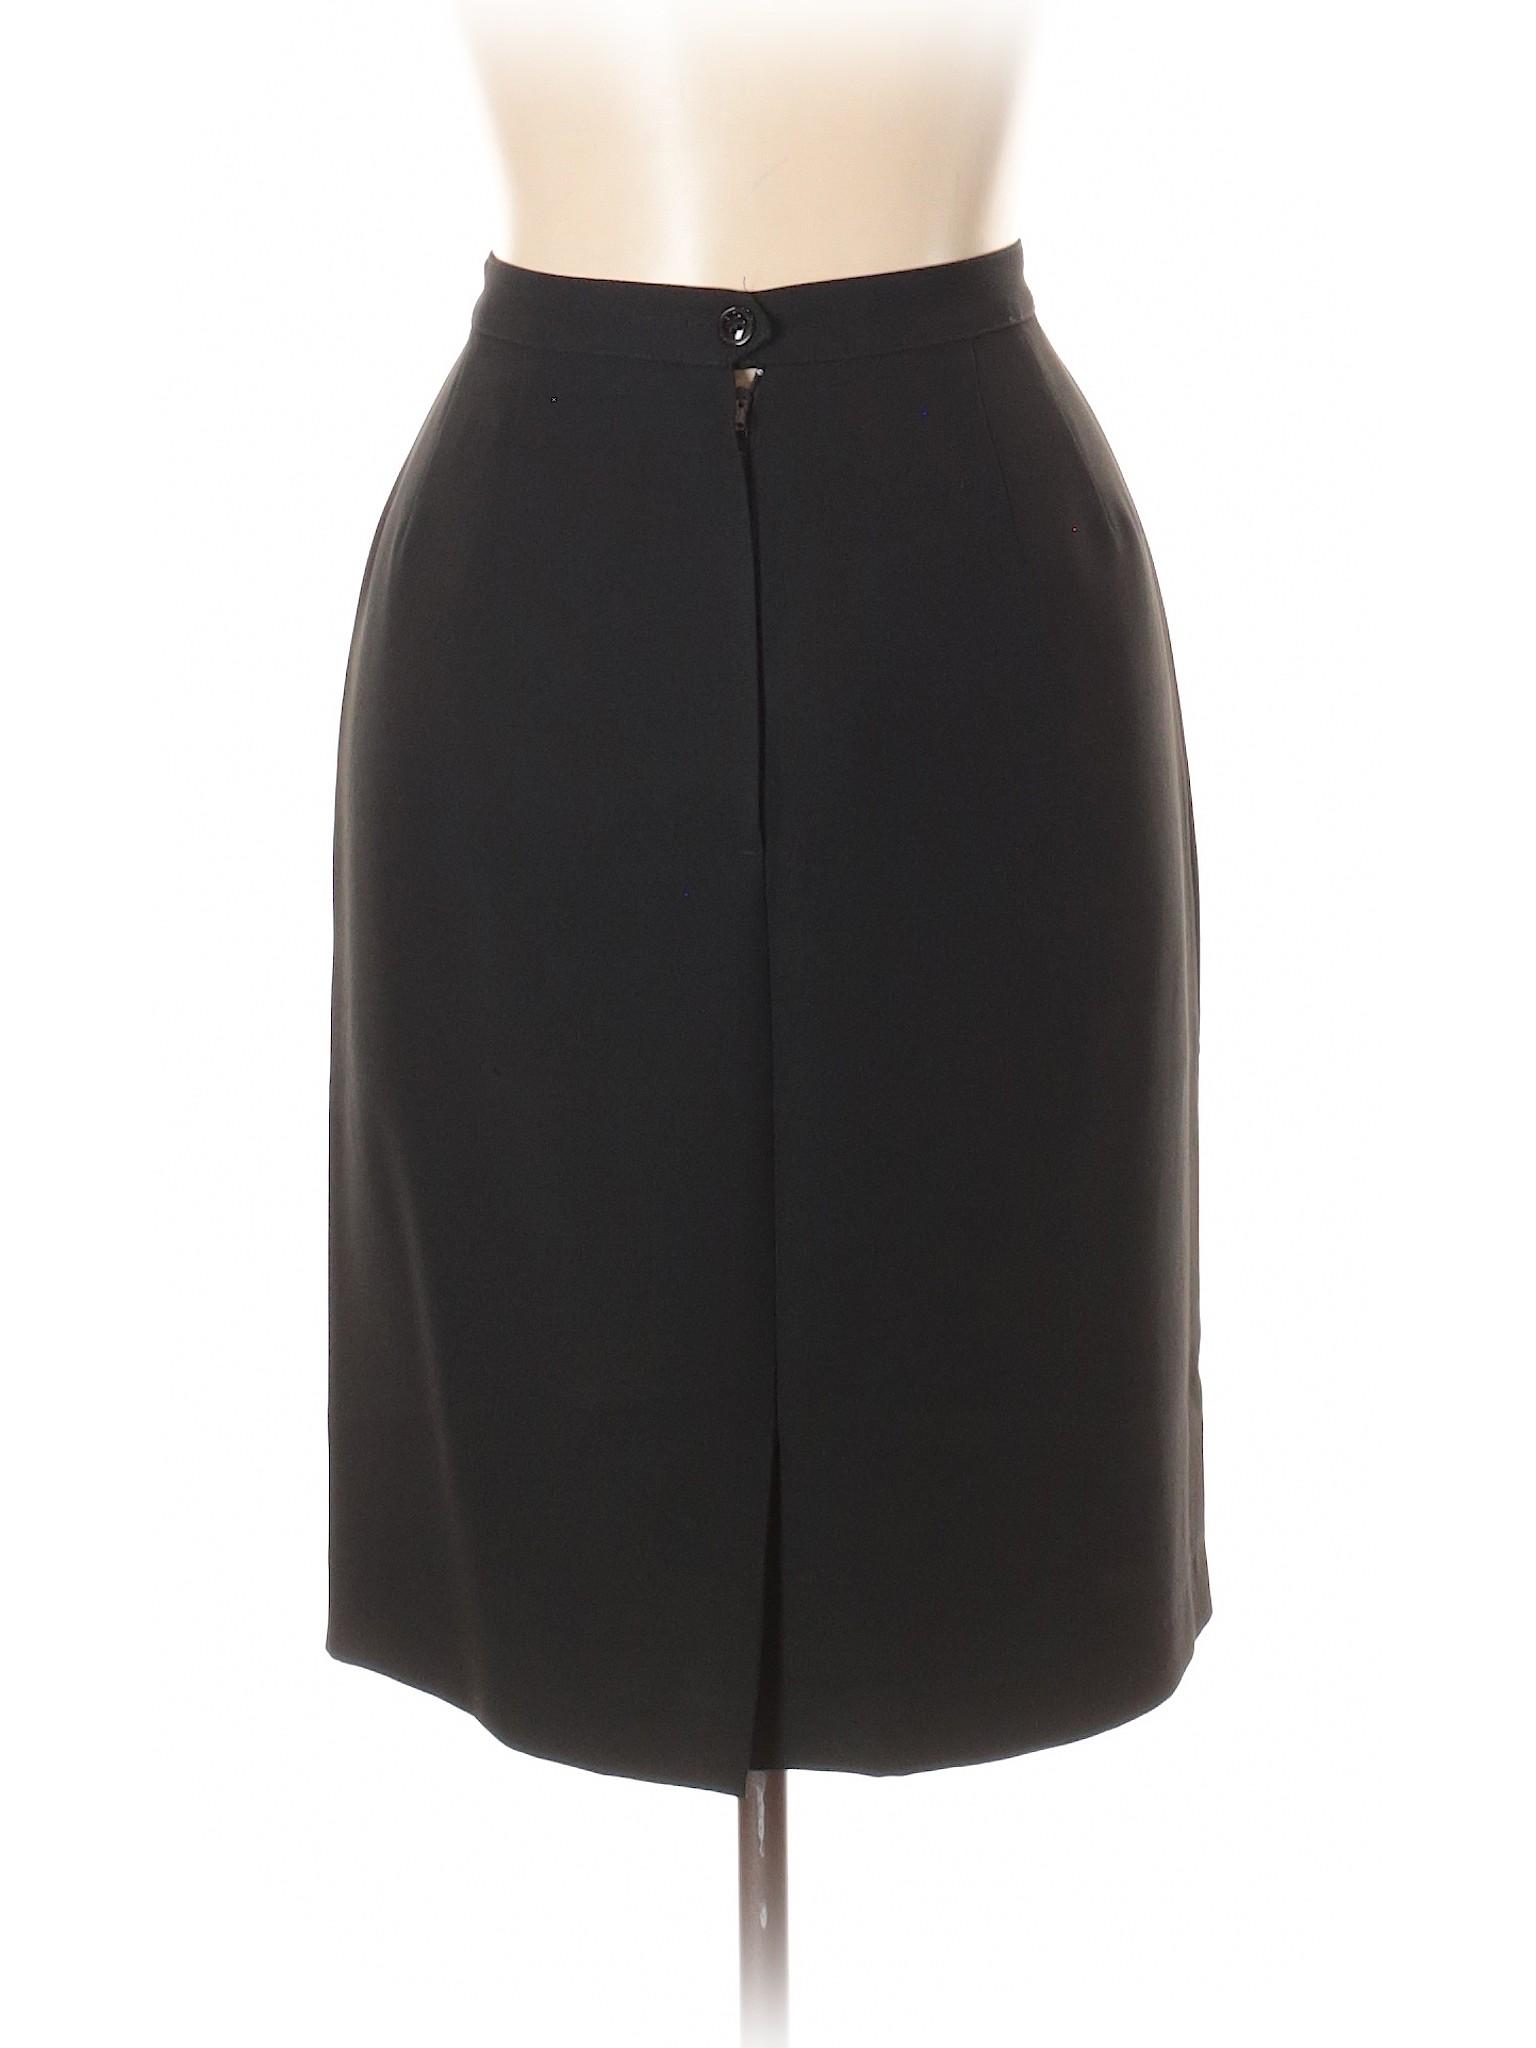 New Boutique Casual York leisure Skirt Jones EFwT1q